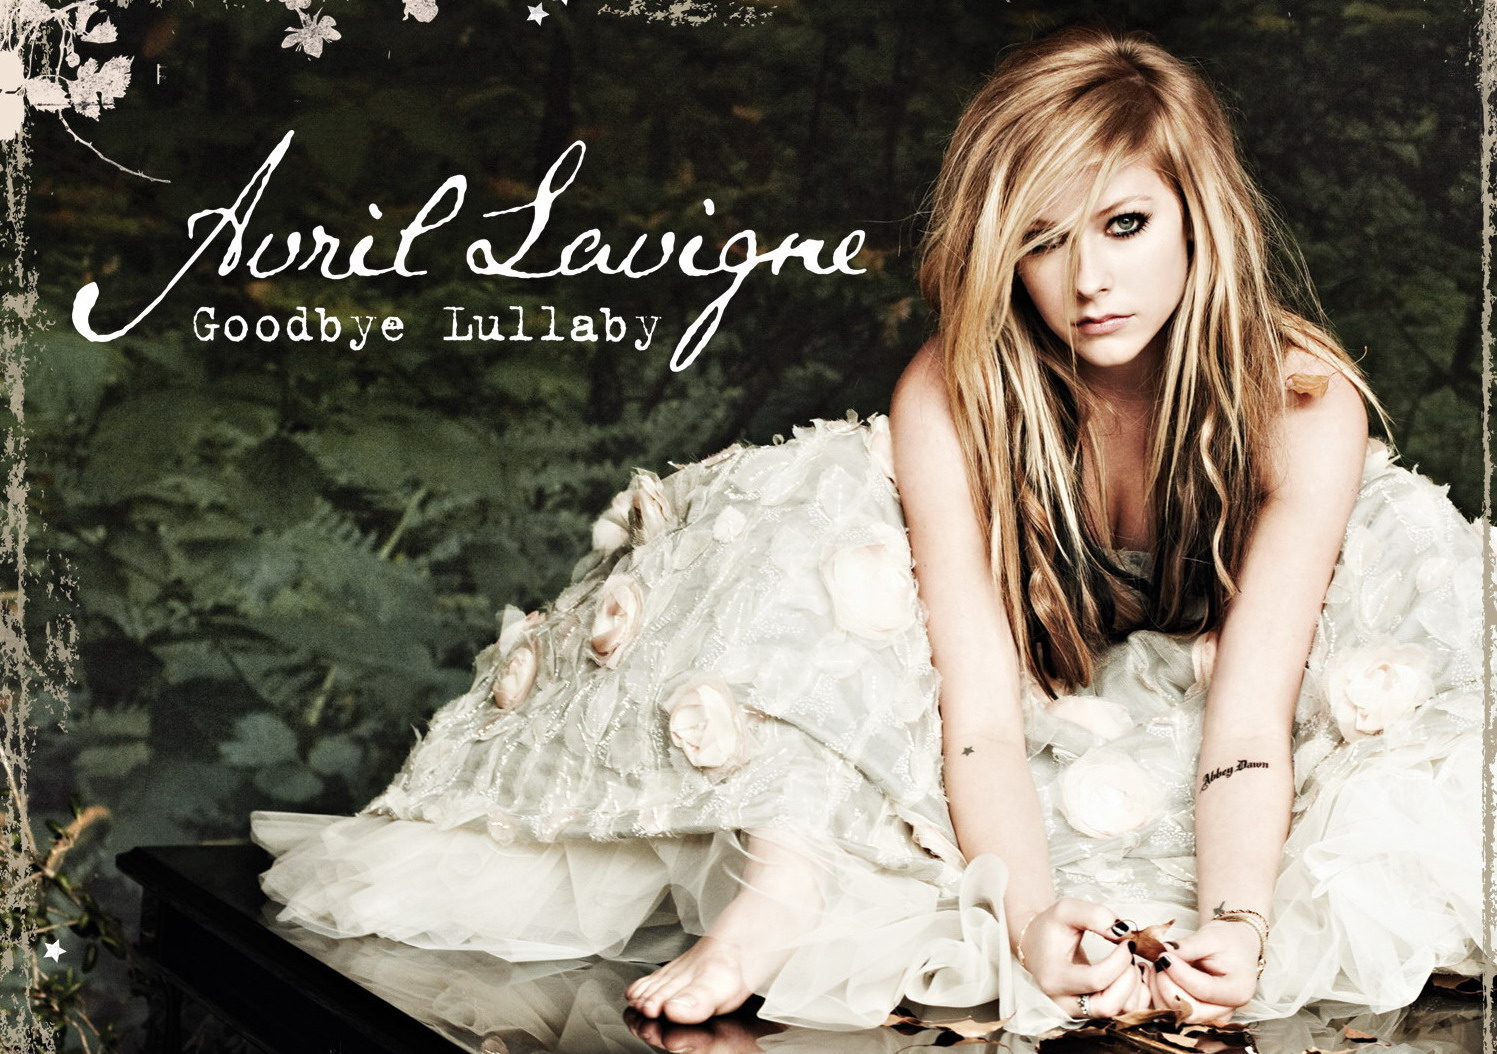 http://2.bp.blogspot.com/-IJcSV3jW1x8/TbbN1zW0utI/AAAAAAAAABE/CpQUNJnX7PM/s1600/1292534513_avril_lavigne_goodbye_lullaby.jpg